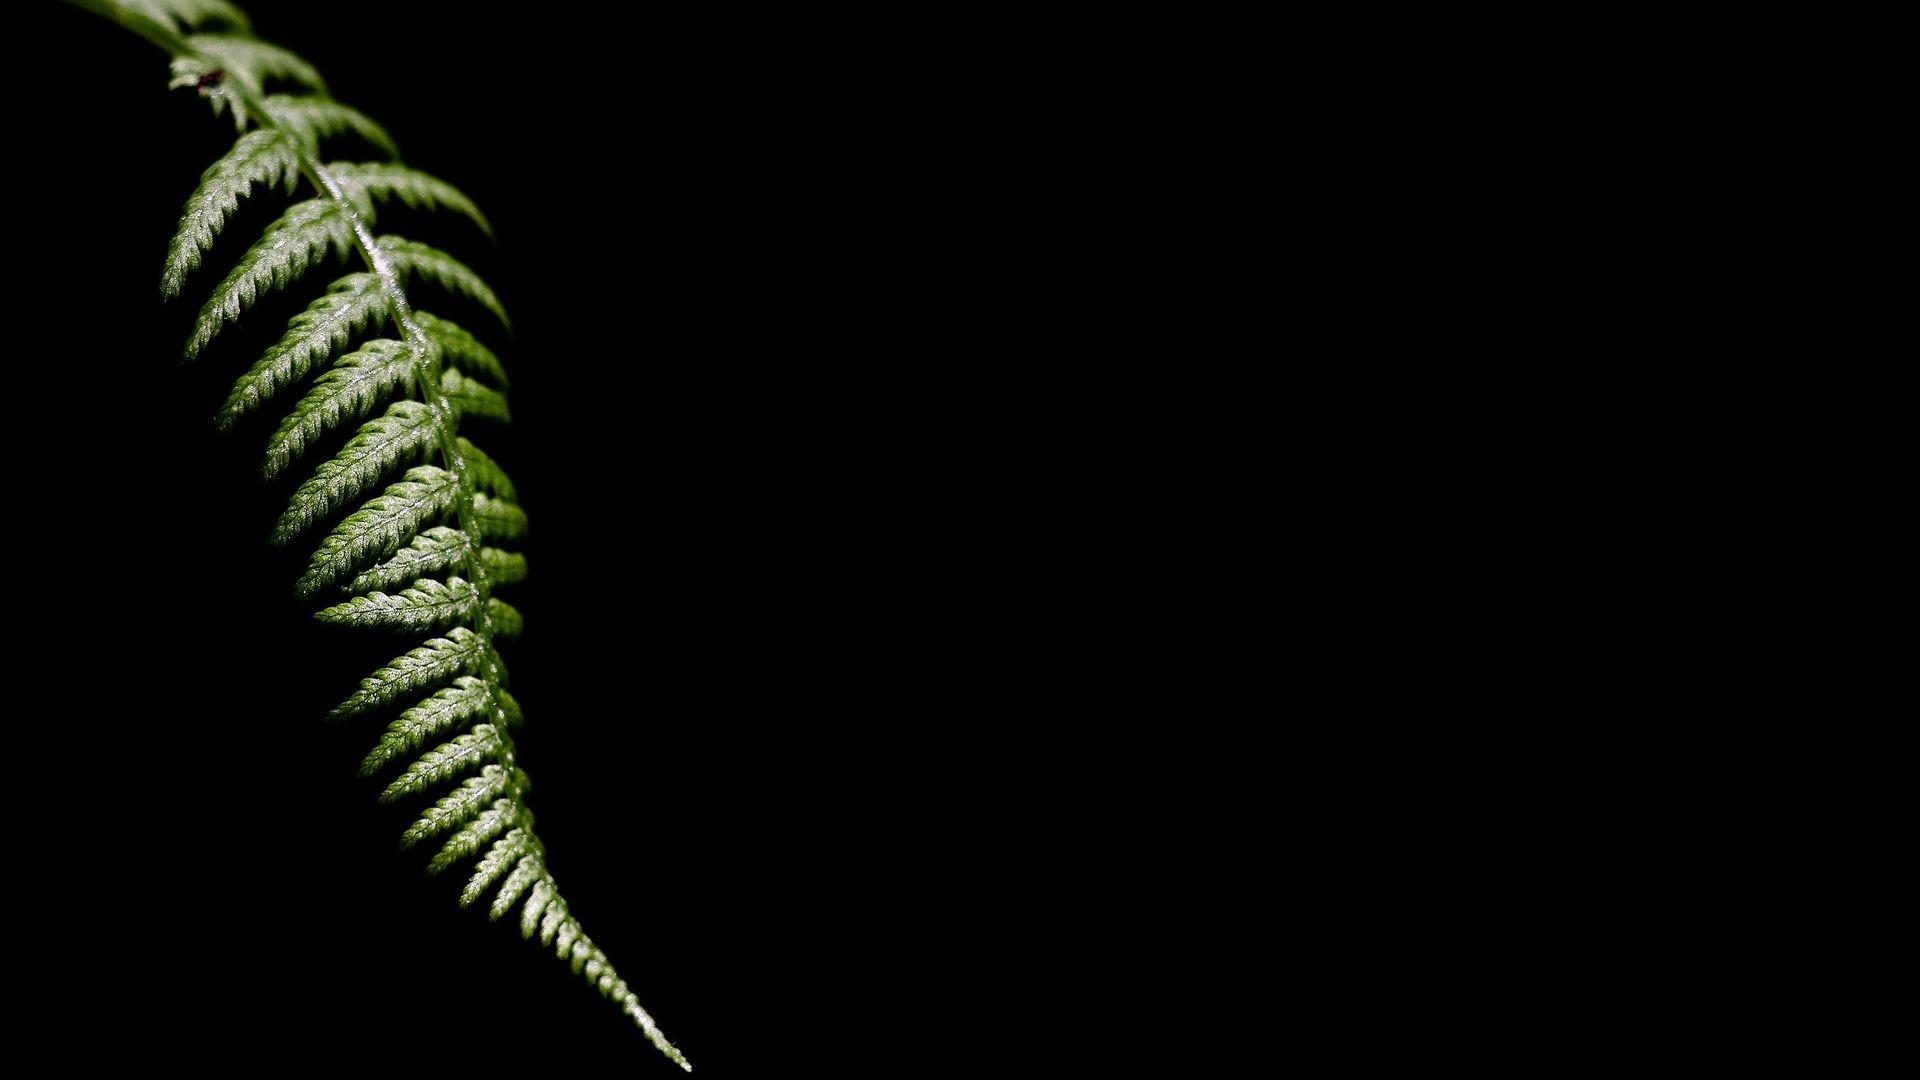 Wallpaper : leaves, black background, nature, minimalism ...